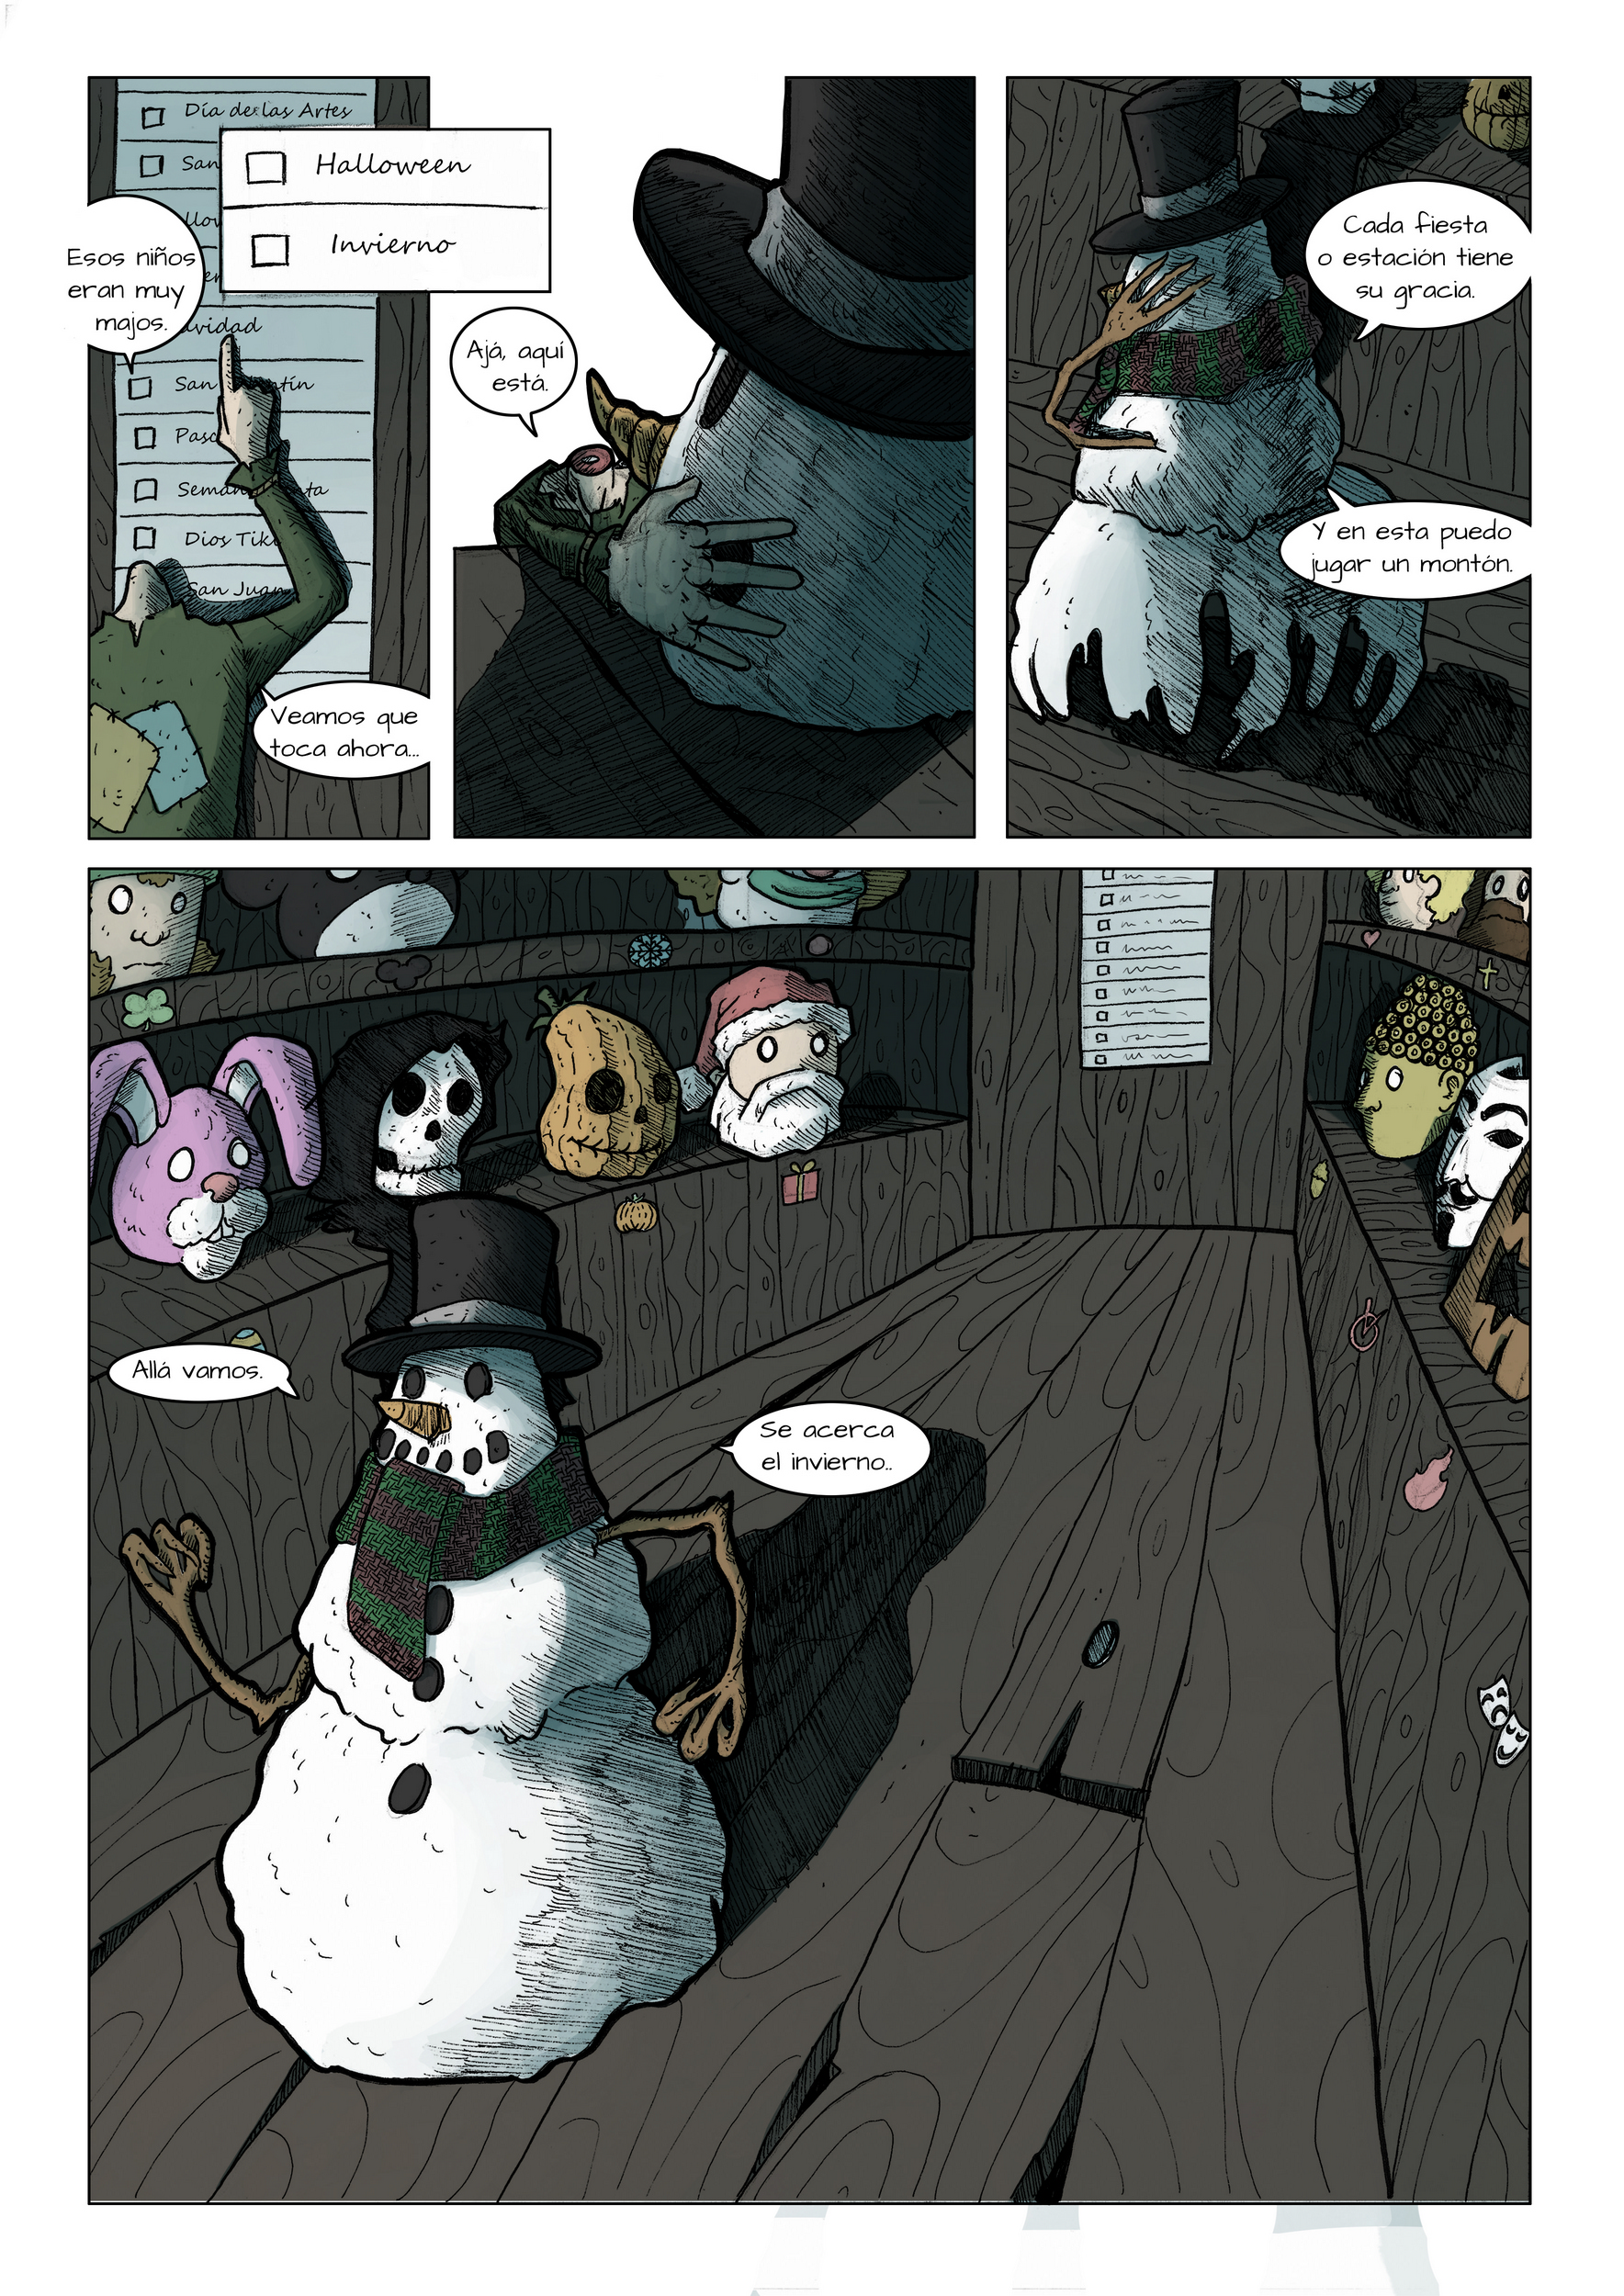 02_Alberto Sánchez López__Espiritu de Halloween - página 3_2500_0006